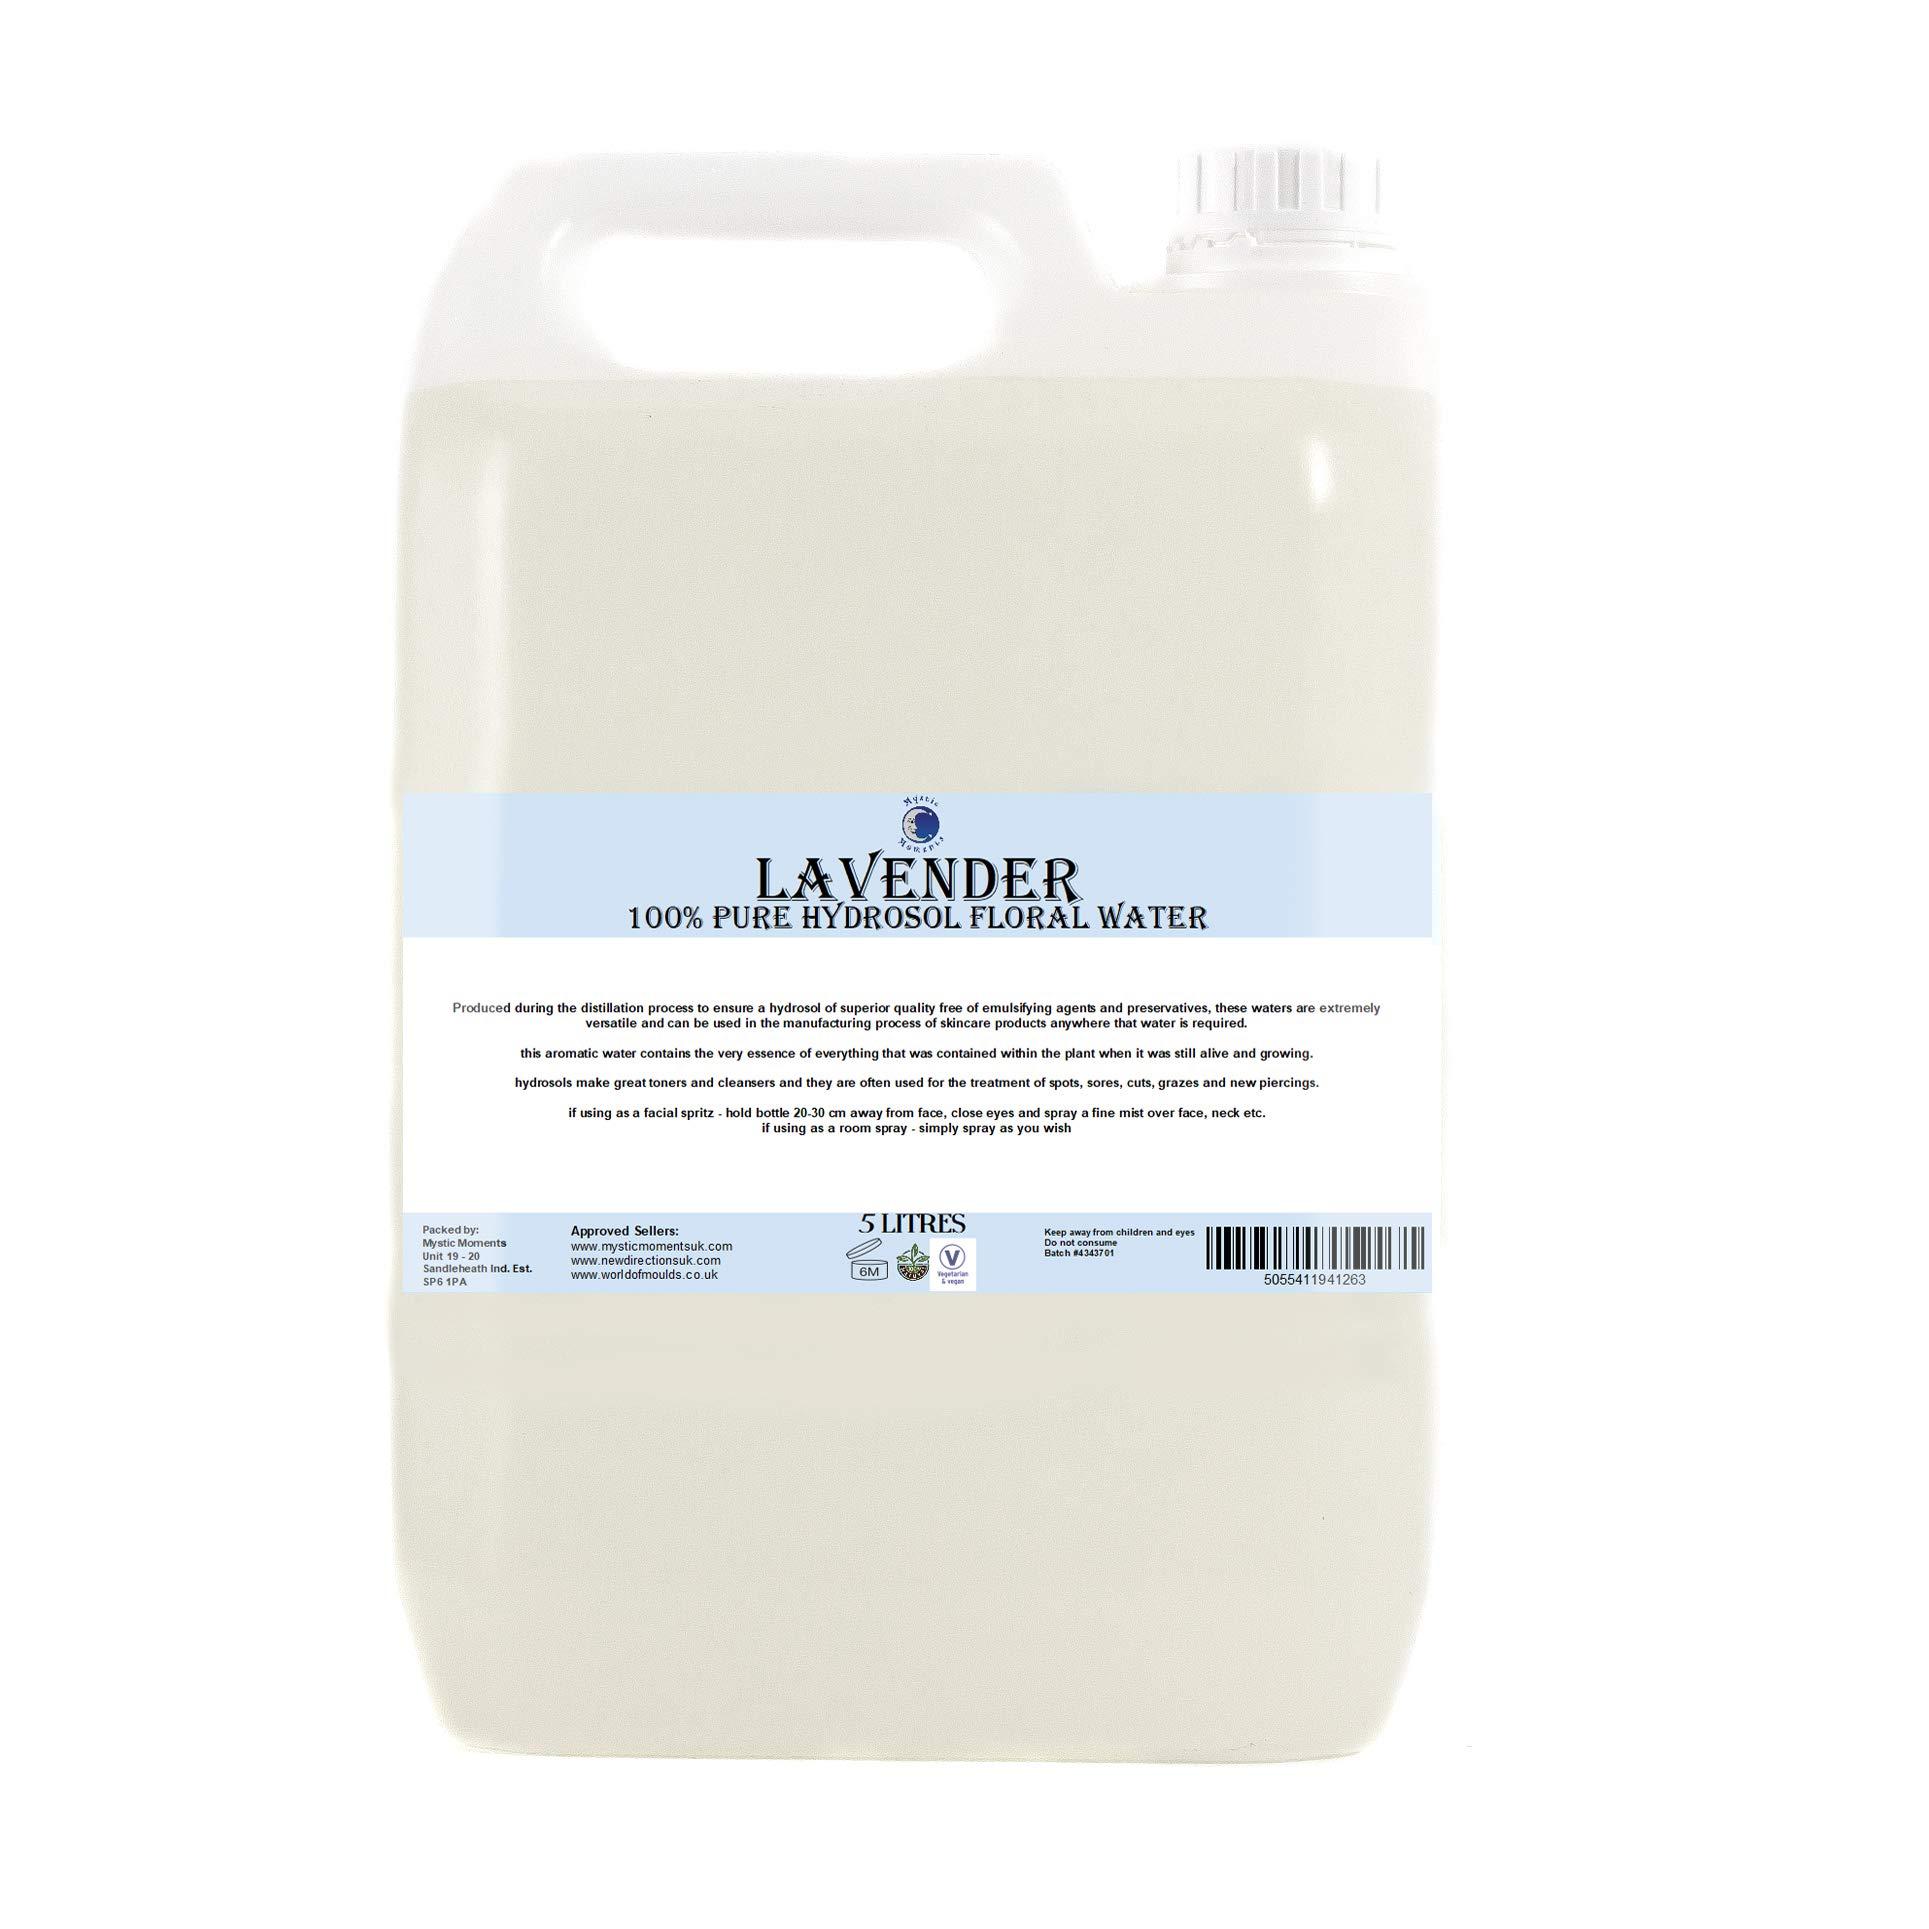 Lavender Hydrosol Floral Water - 5 litres